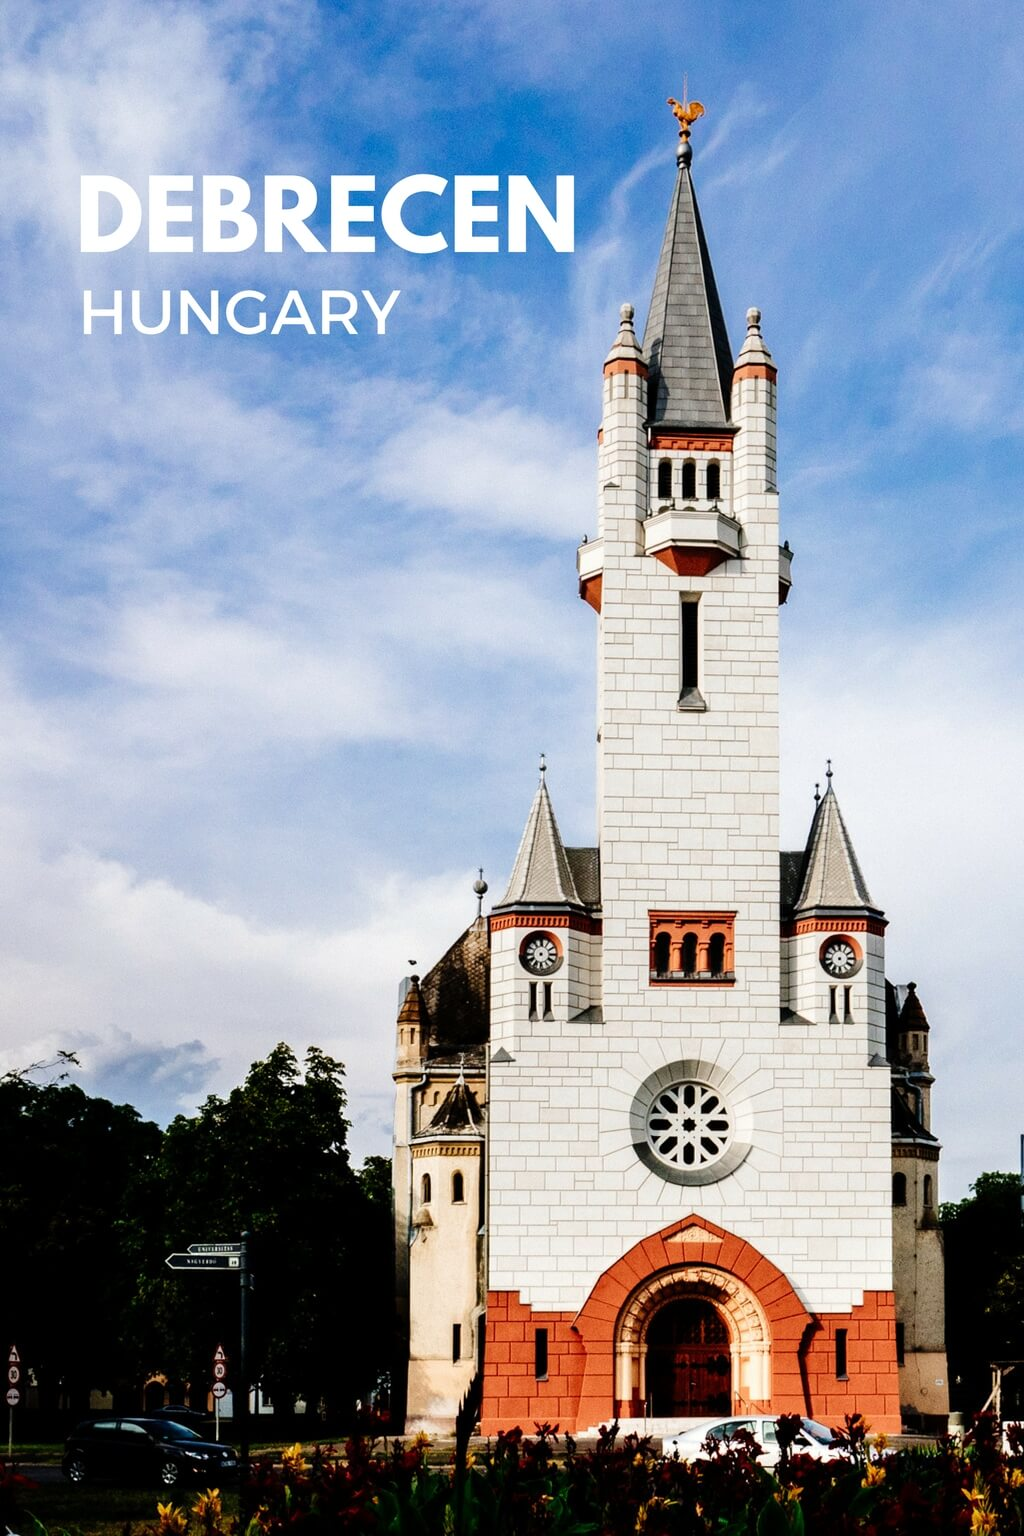 Debrecen: Venturing Into Eastern Hungary